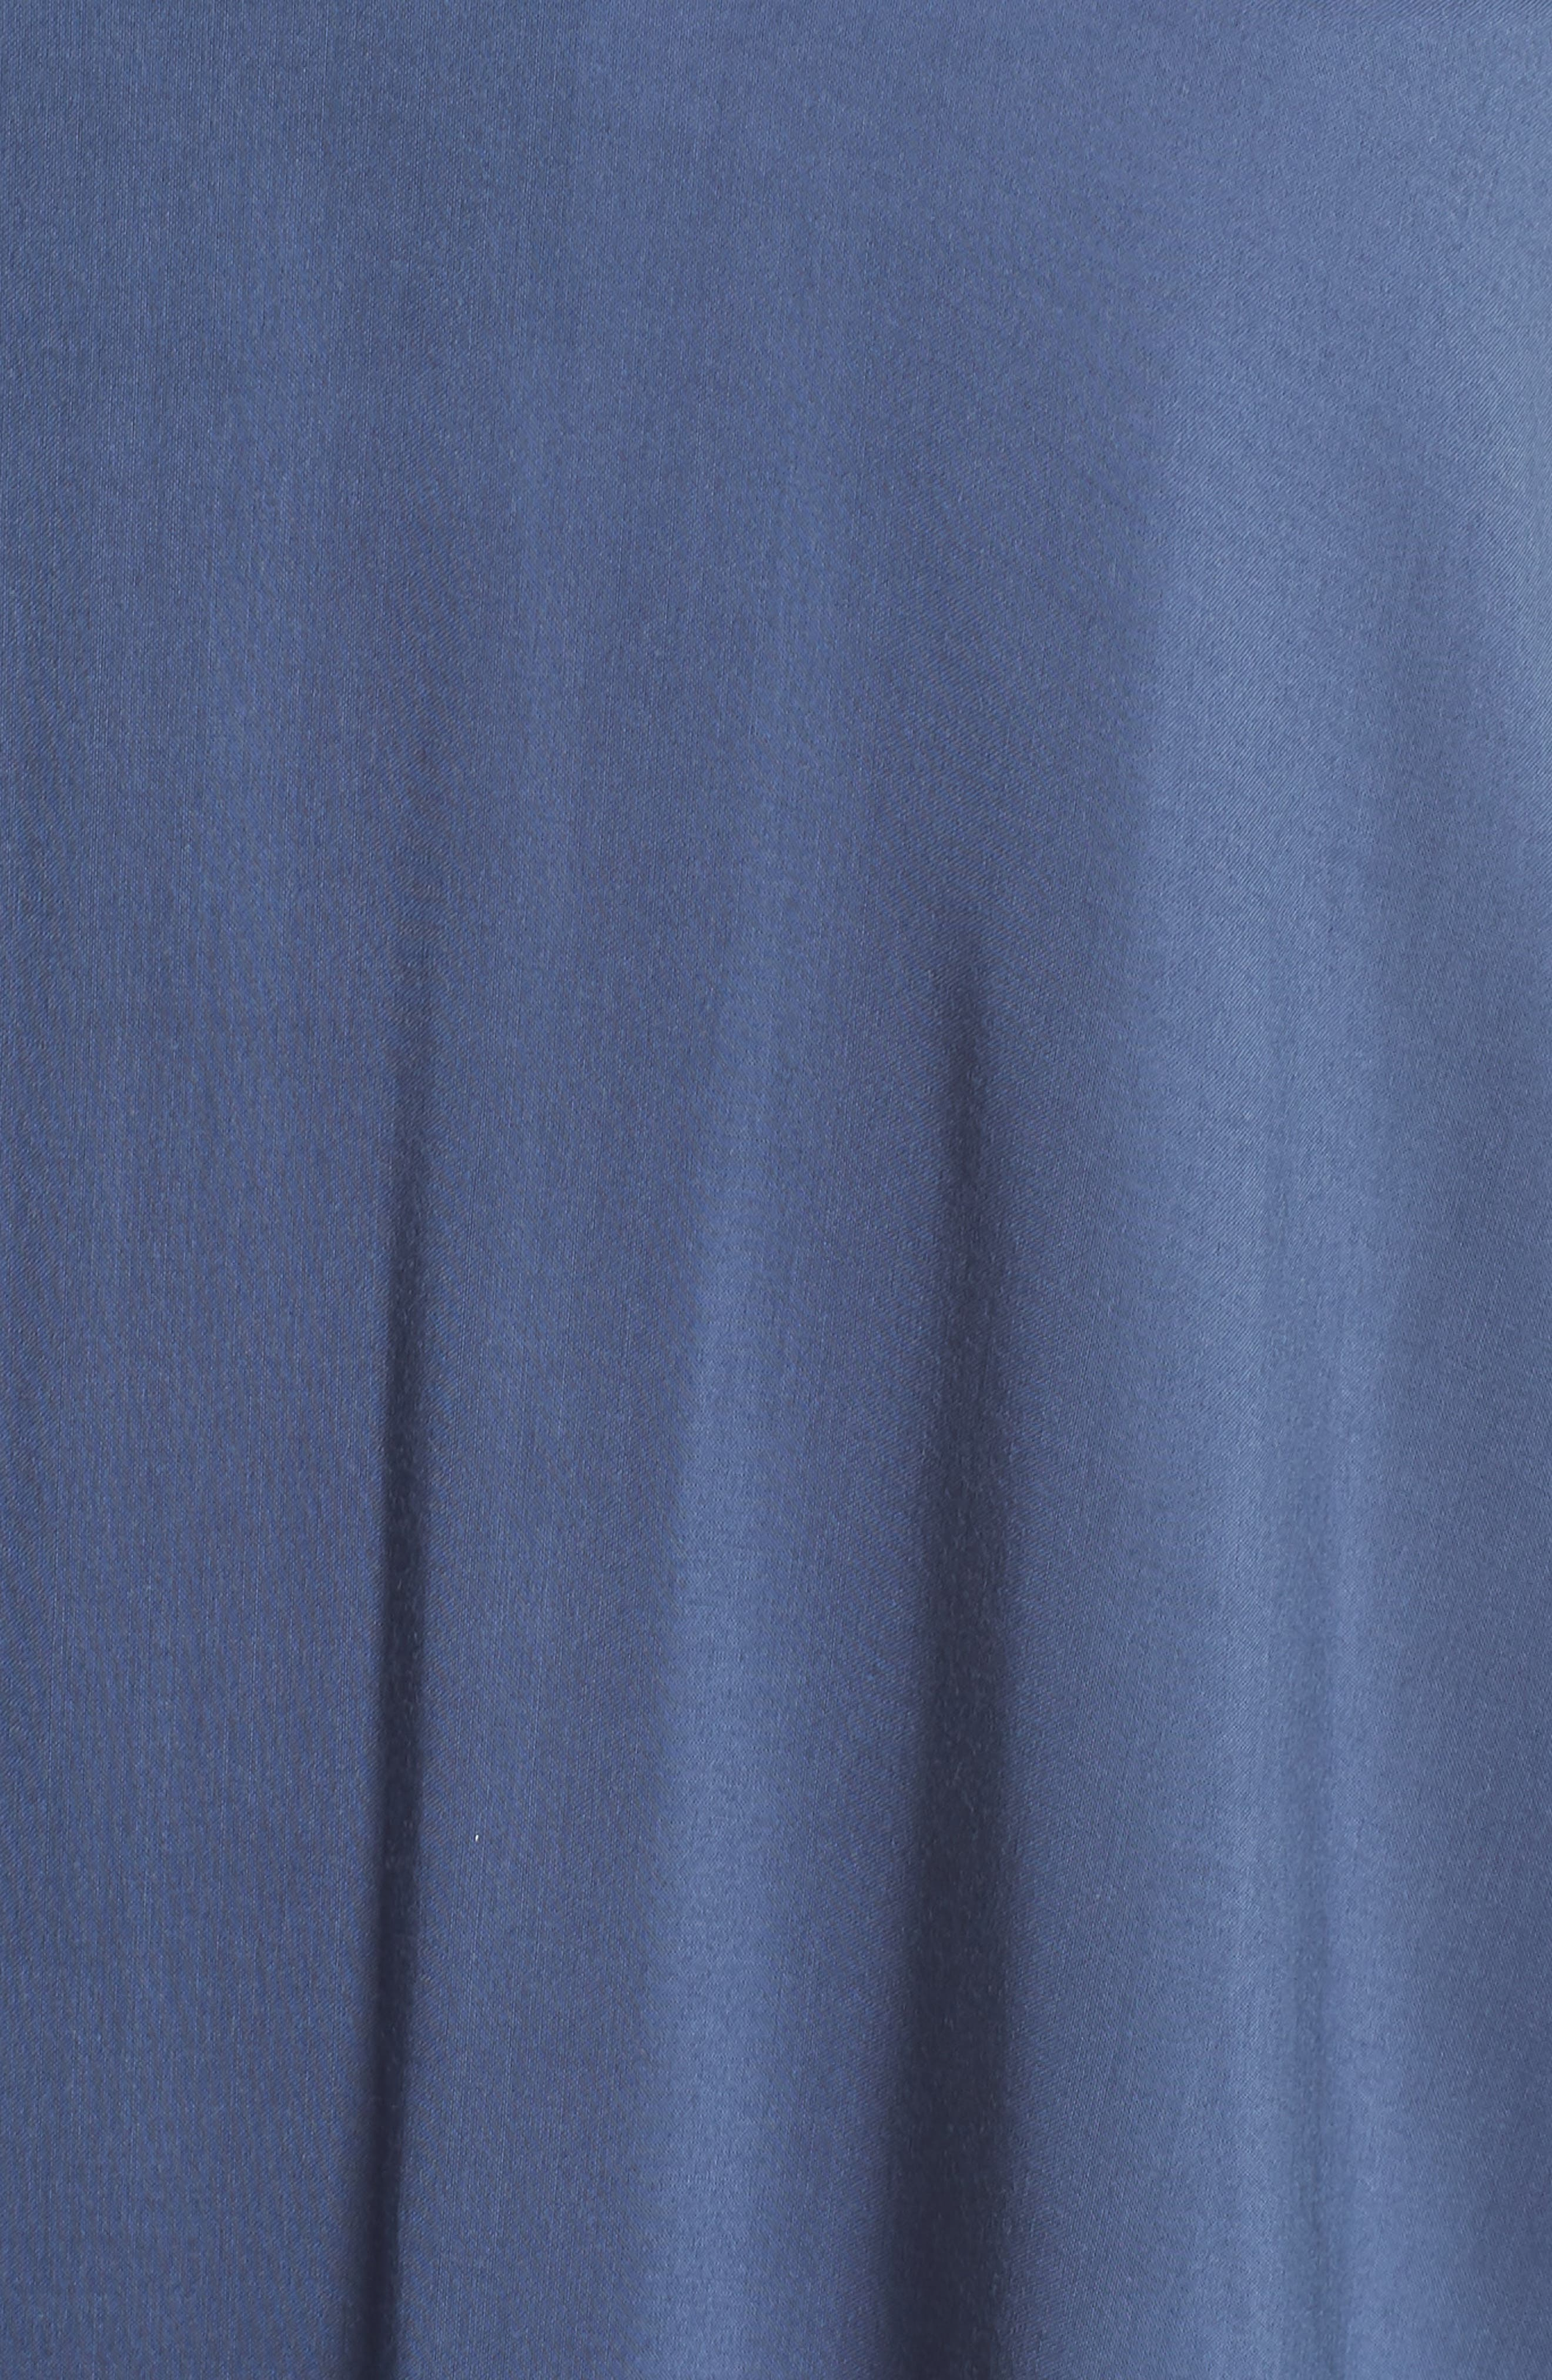 Strapless Keyhole Cover-Up Maxi Dress,                             Alternate thumbnail 5, color,                             Indigo